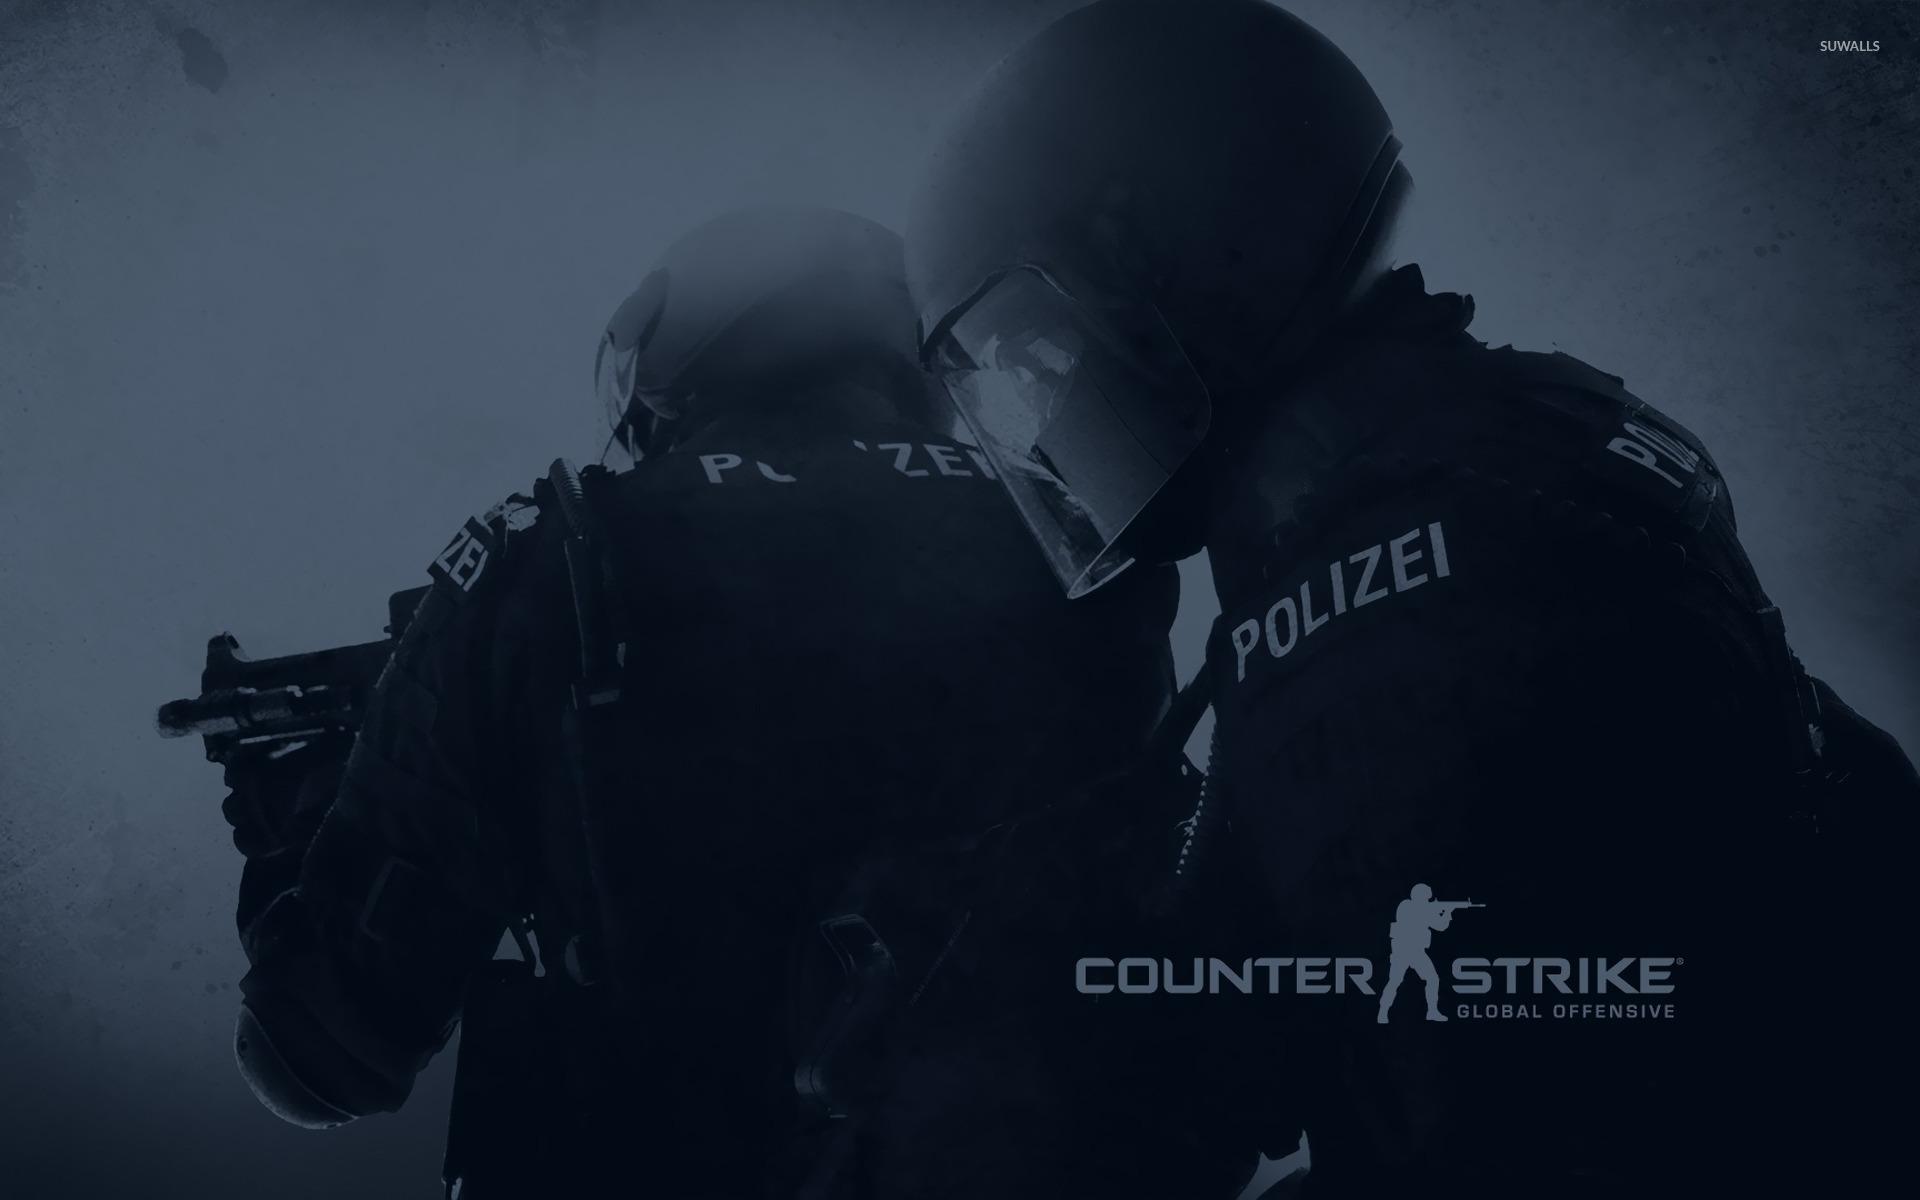 Counter-Strike: Global Offensive [5] Wallpaper